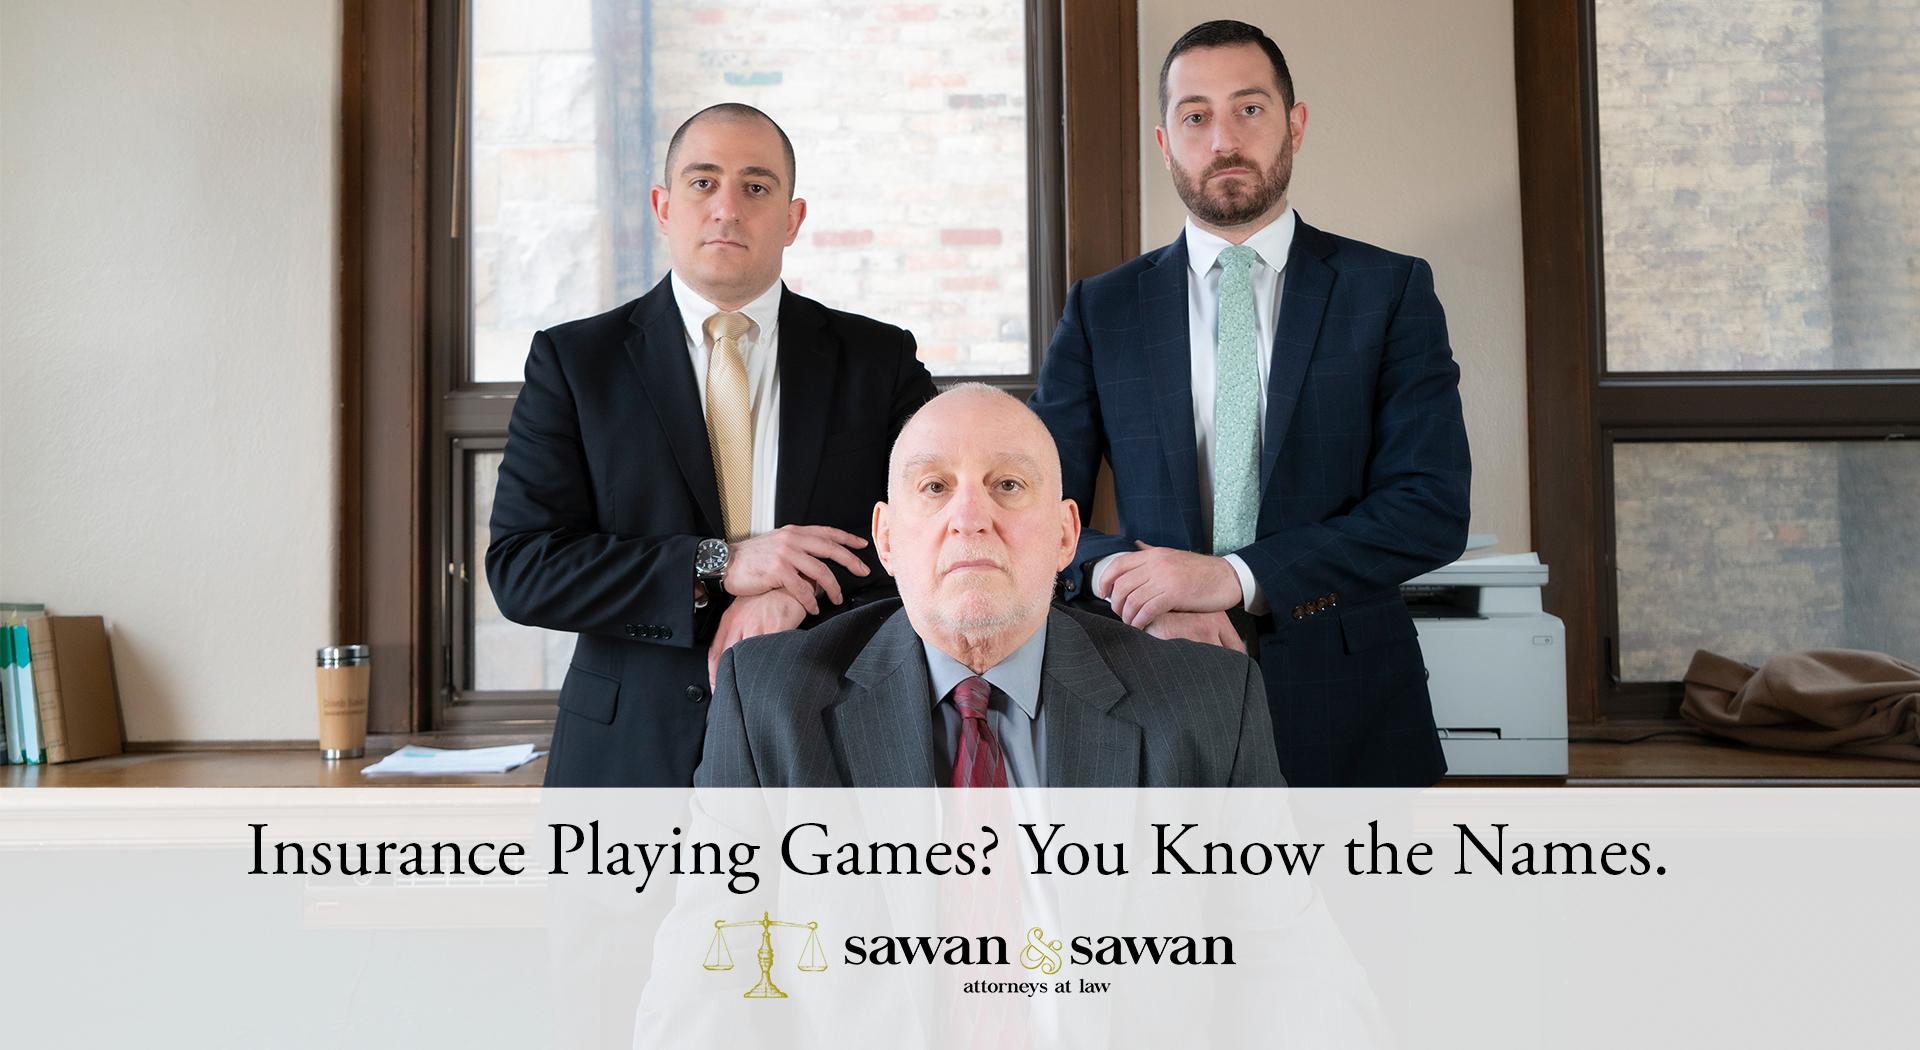 Toledo Speed Camera Locations, Personal Injury Lawyers | Sawan & Sawan LLC | 419-900-0955